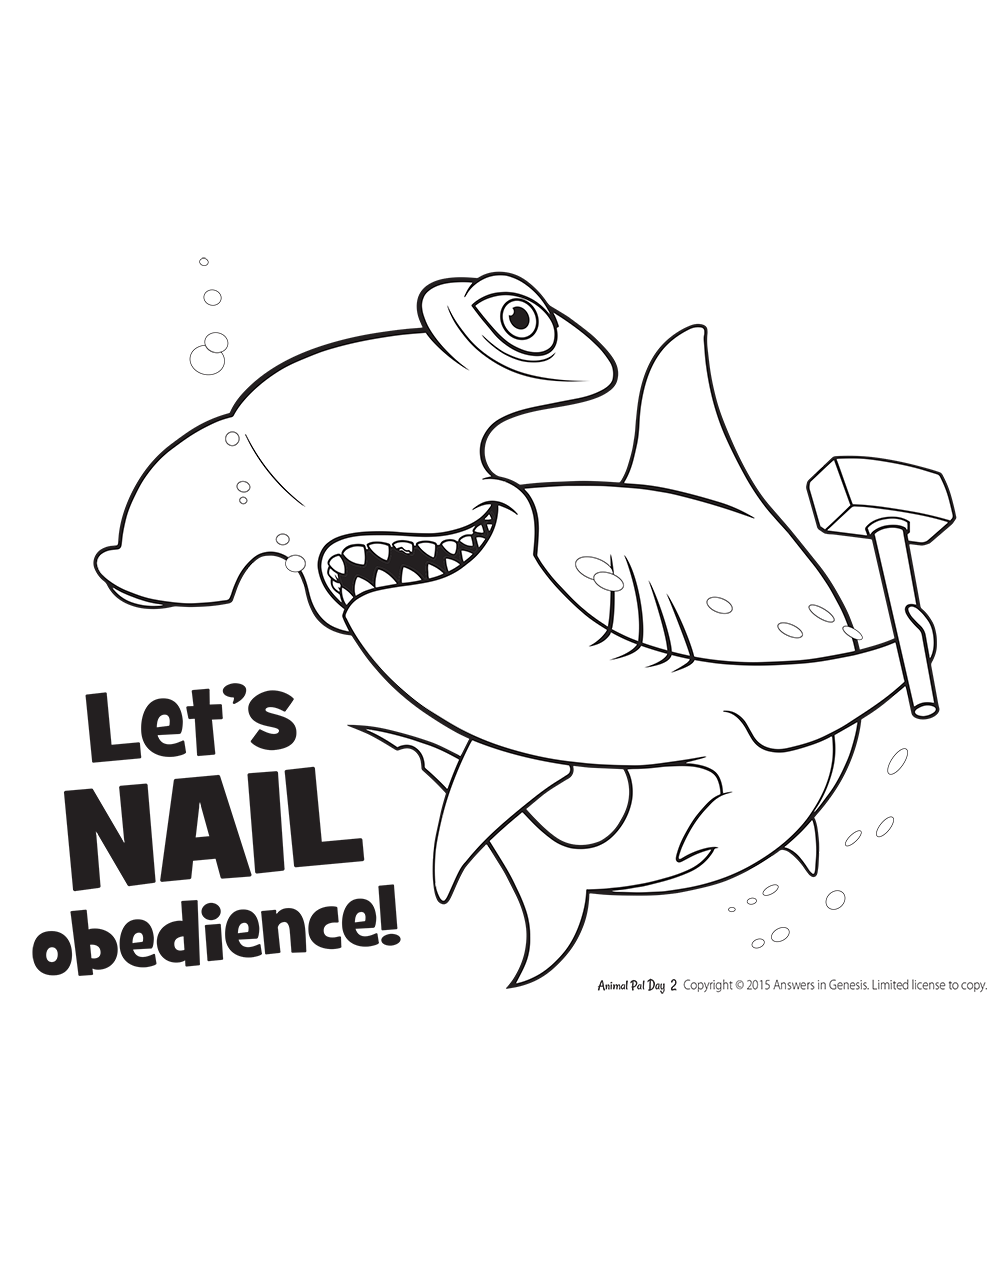 Nail Obedience